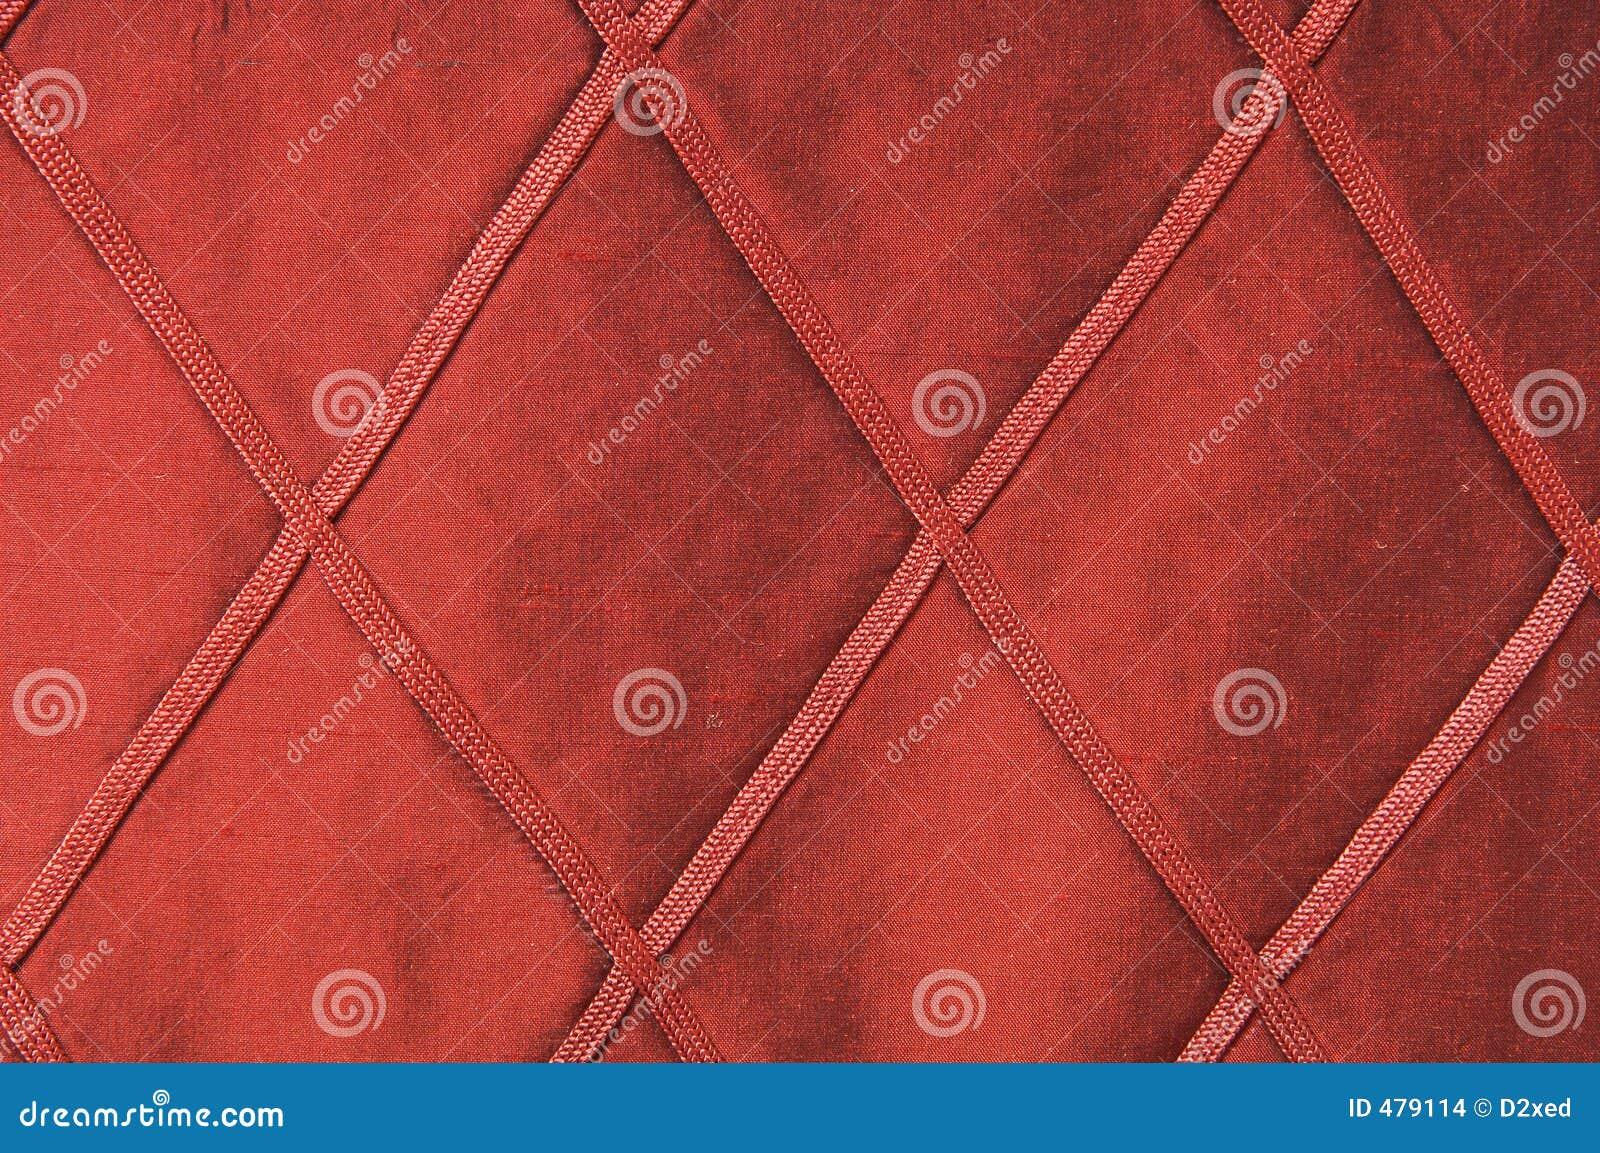 Tissu rouge luxueux comme fond